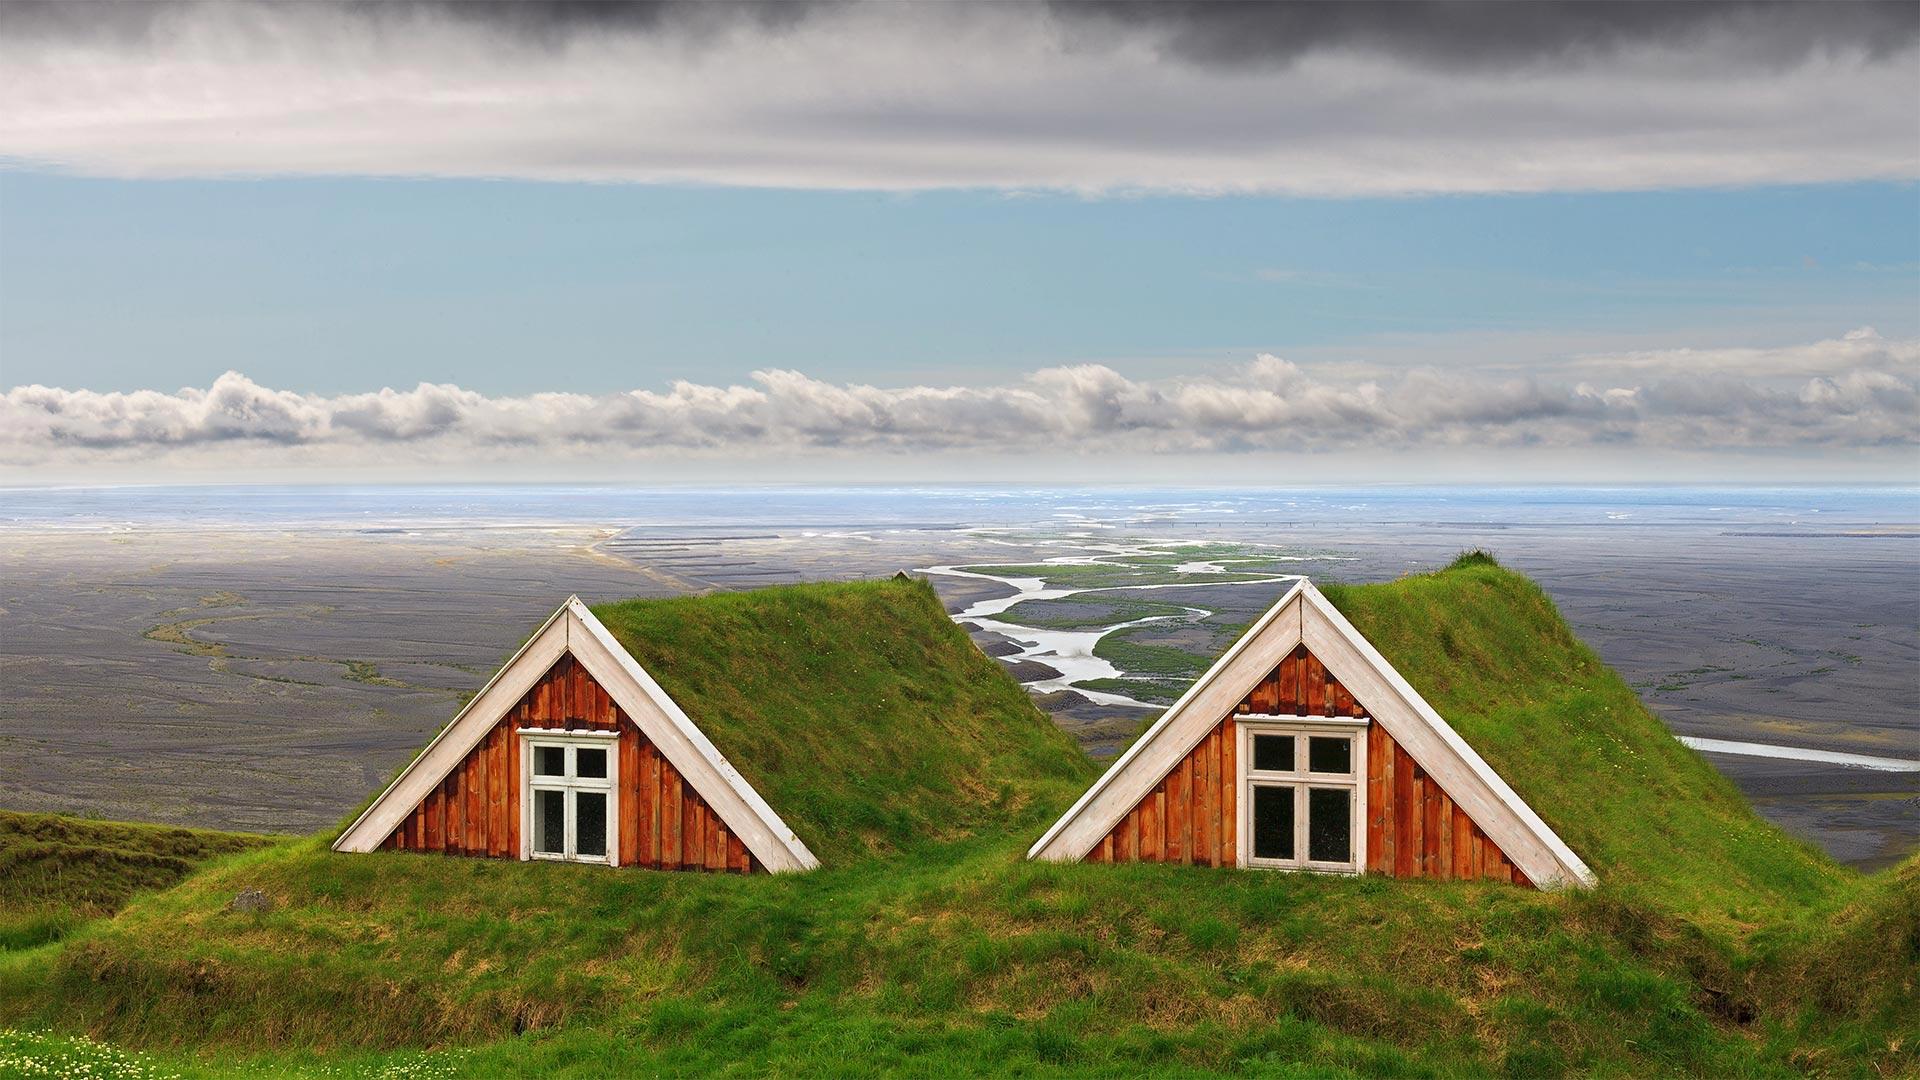 Turf farmhouses at Skaftafell, Vatnajökull National Park, Iceland (© Jarcosa/Getty Images)(Bing United States)